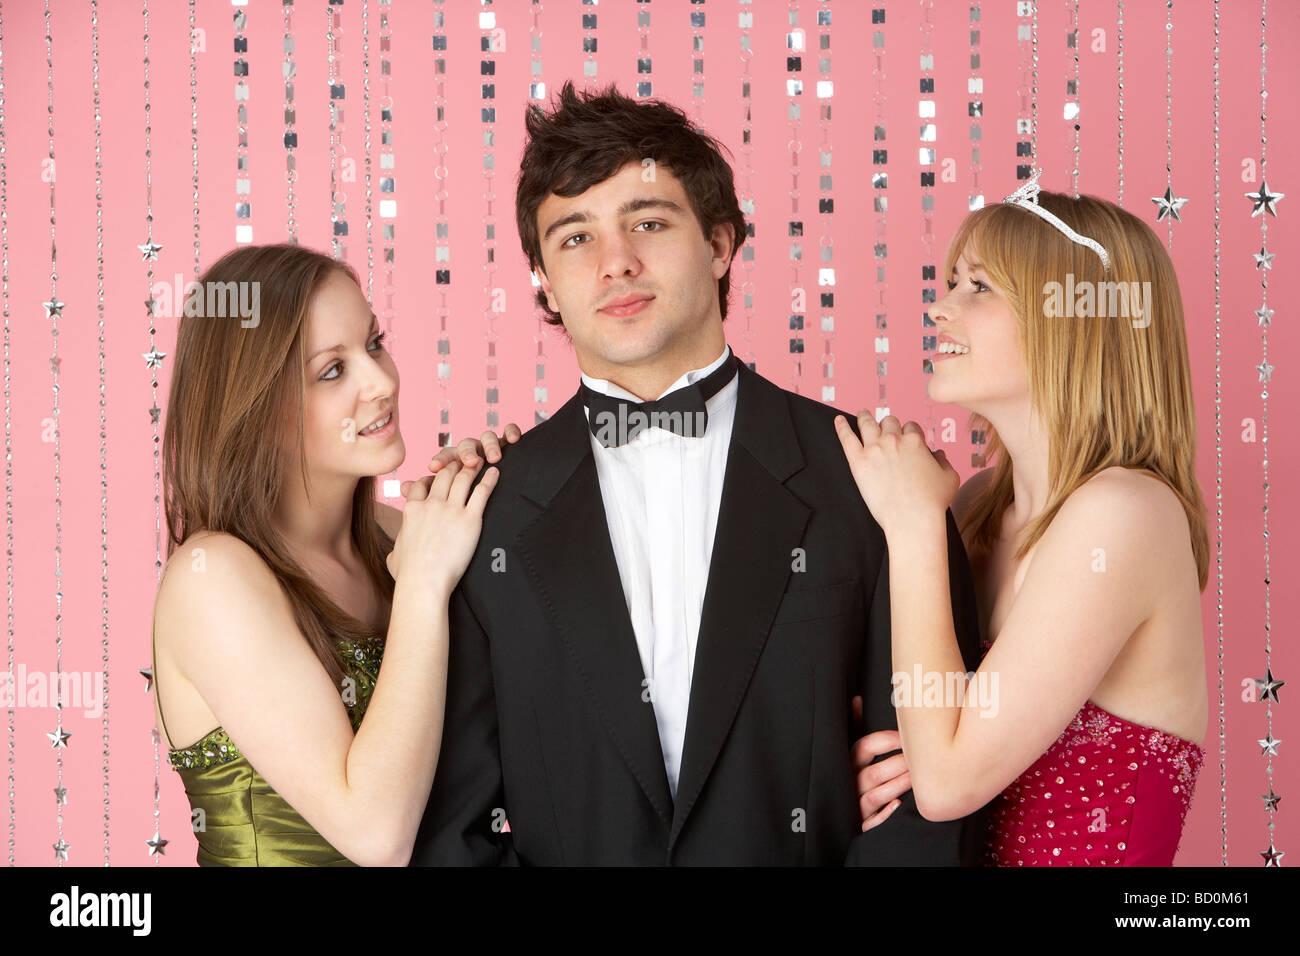 Two Teenage Girls Looking At Boy - Stock Image